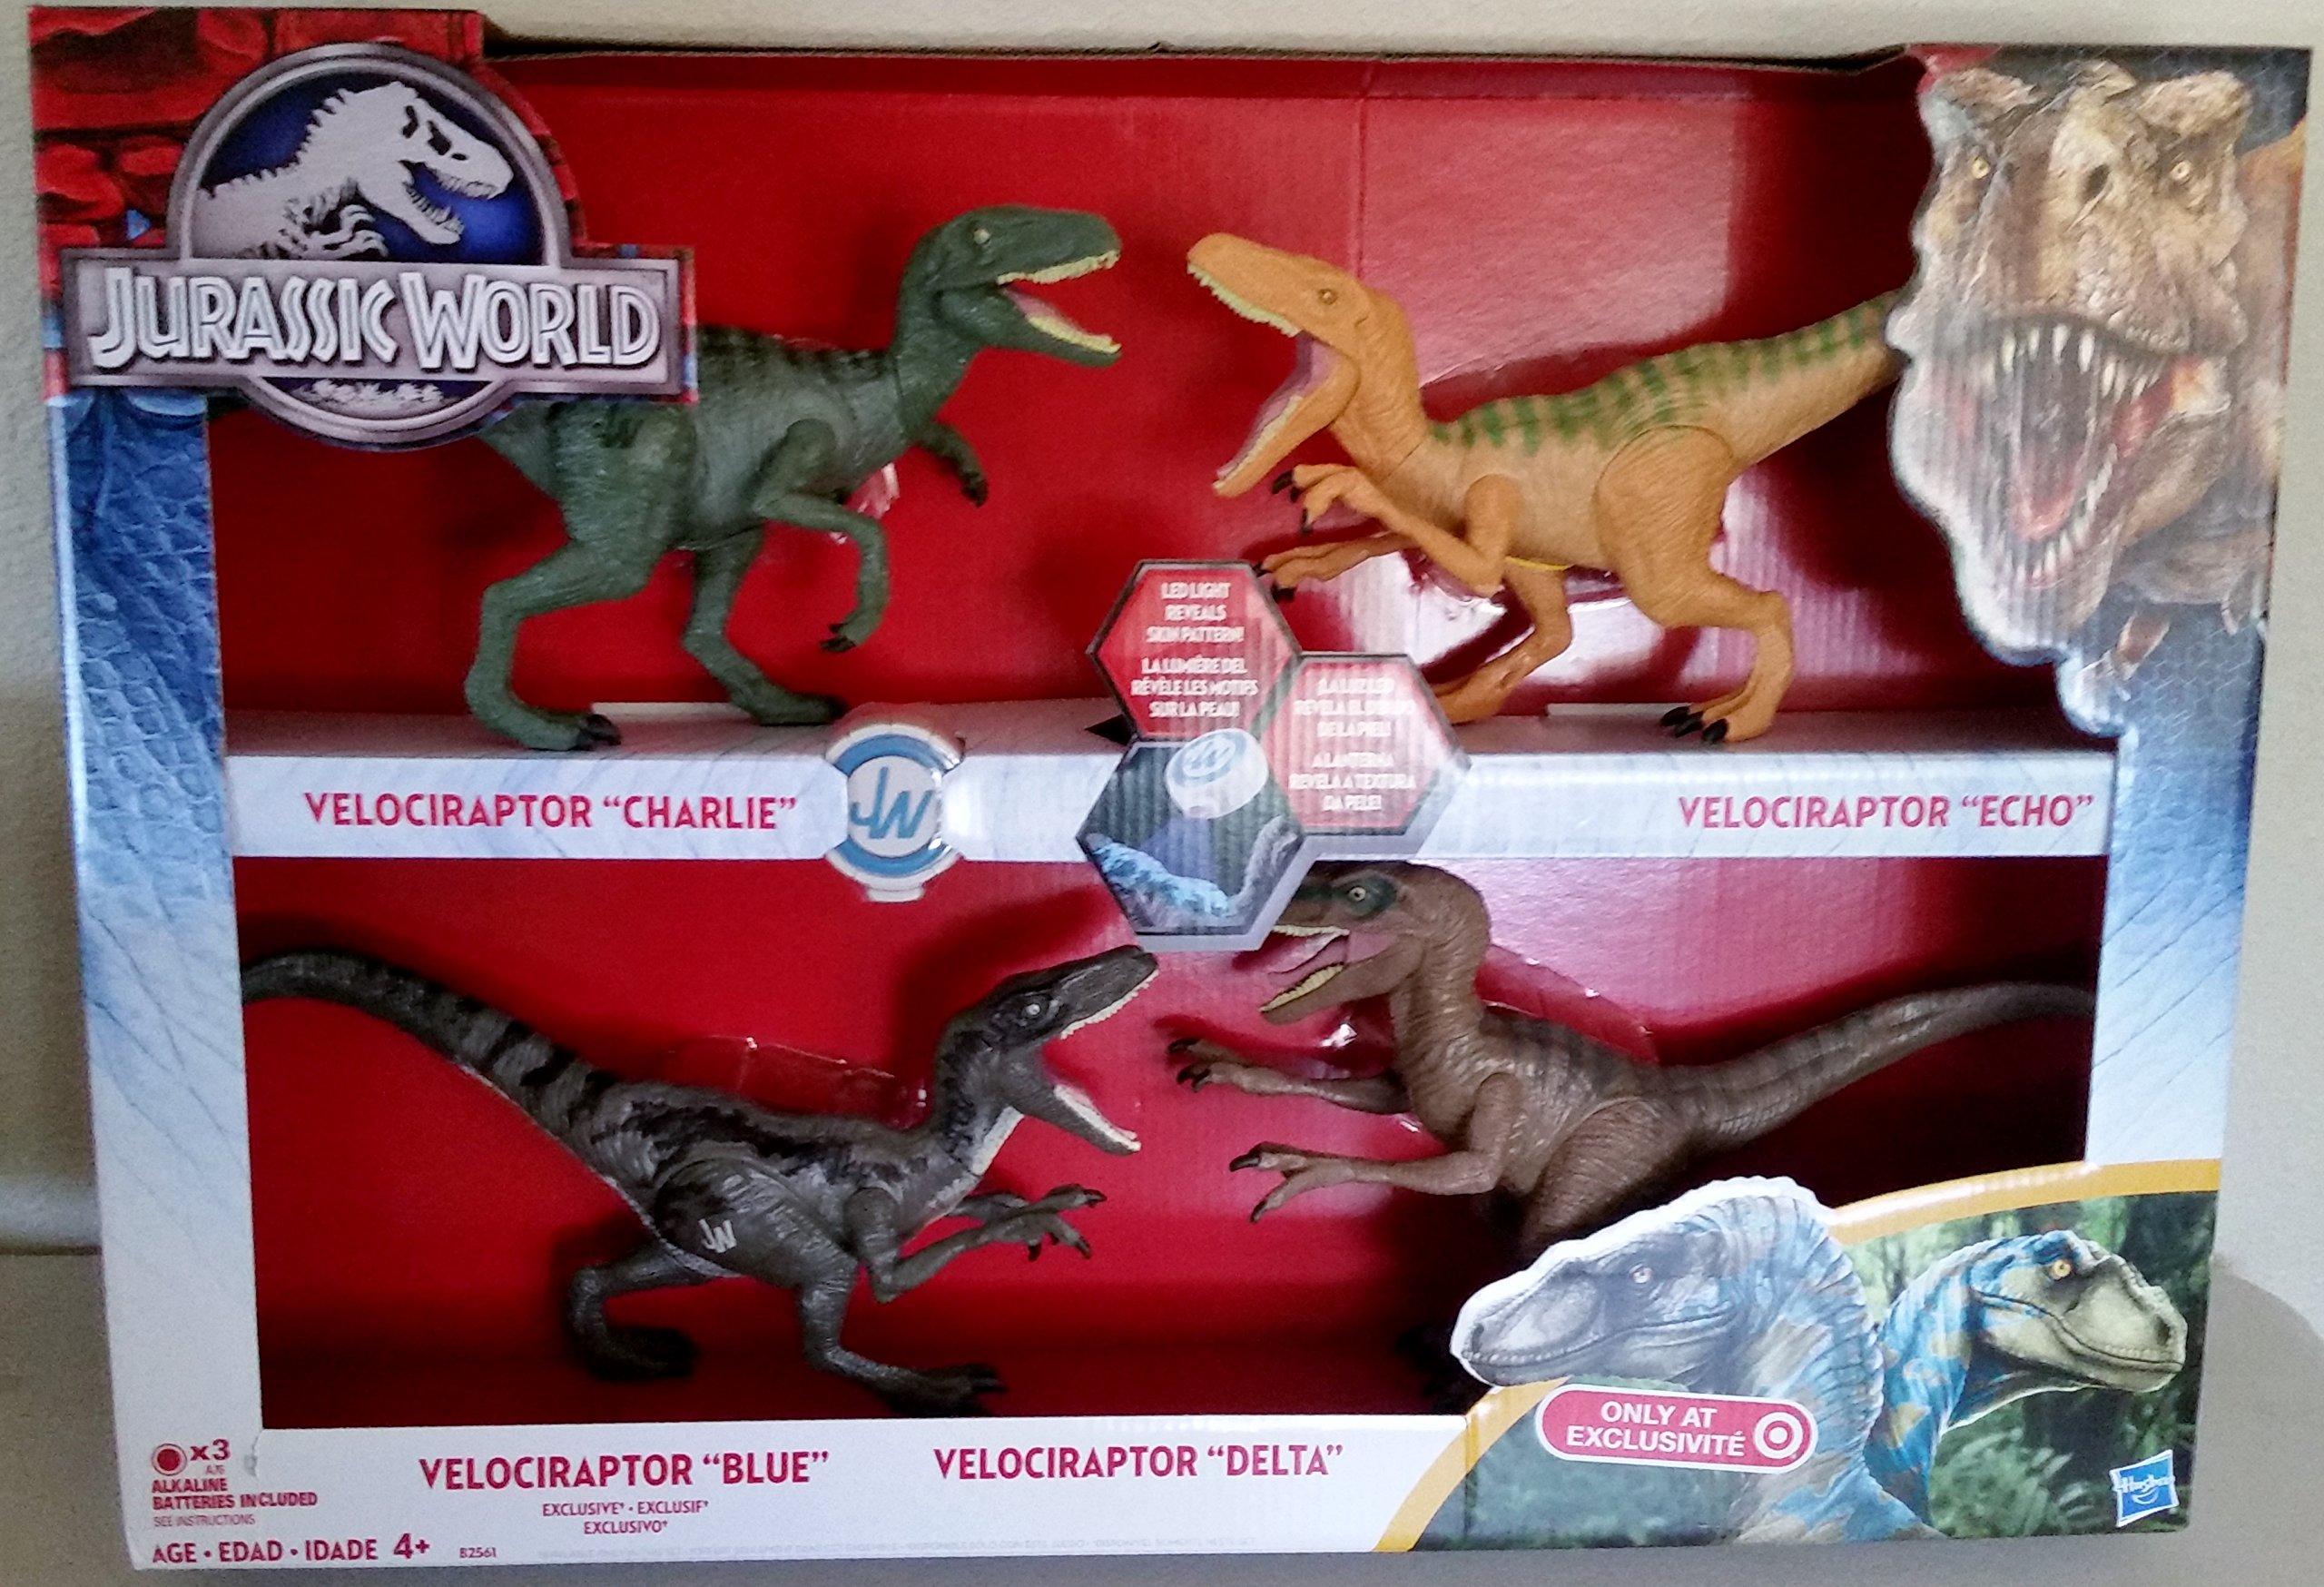 Jurassic World Velociraptor Charlie Dinosaur Figure Toy Hasbro 2015